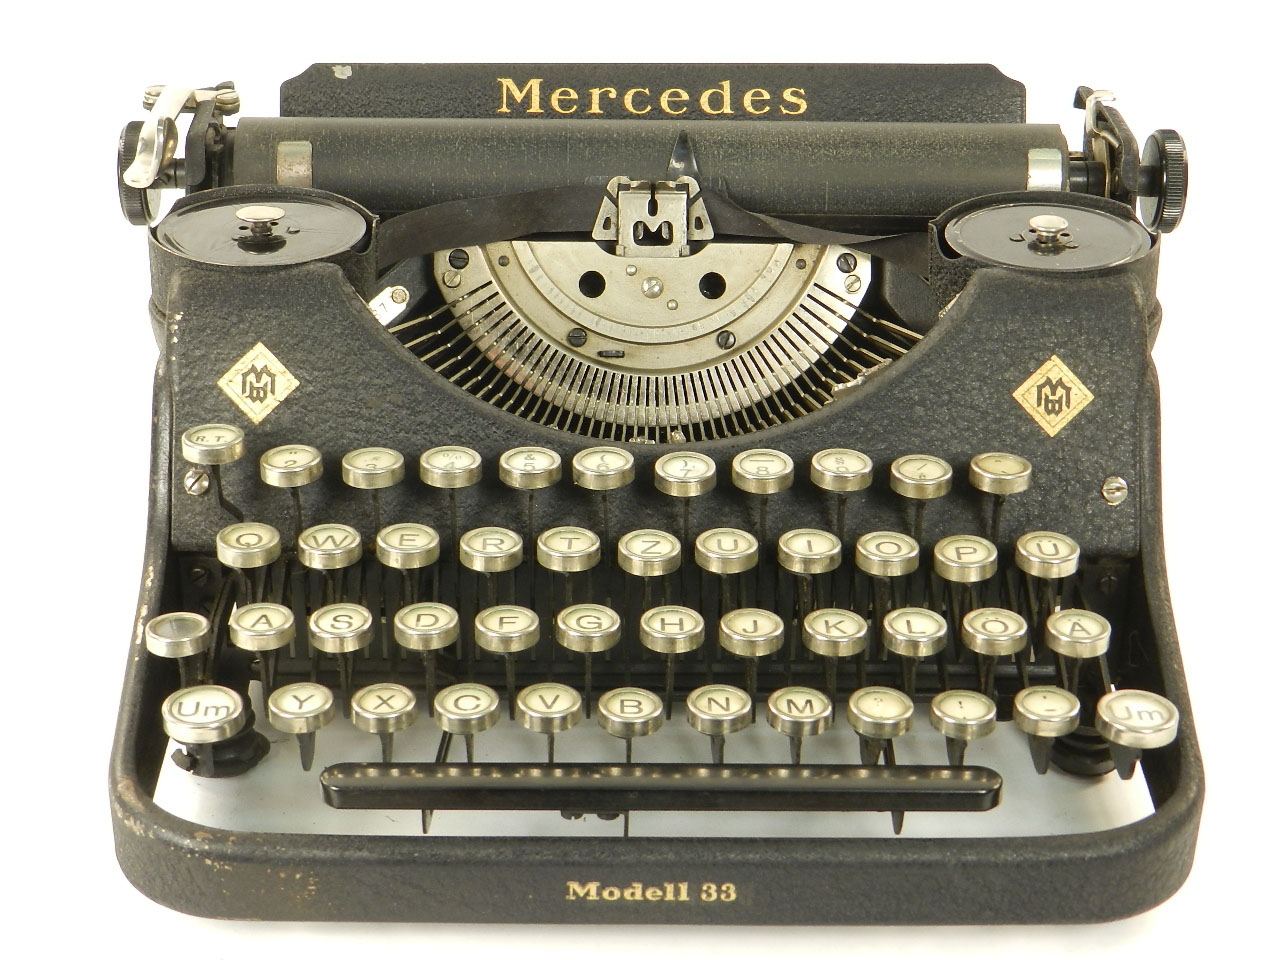 Imagen MERCEDES MODELL 33 AÑO 1930 26221